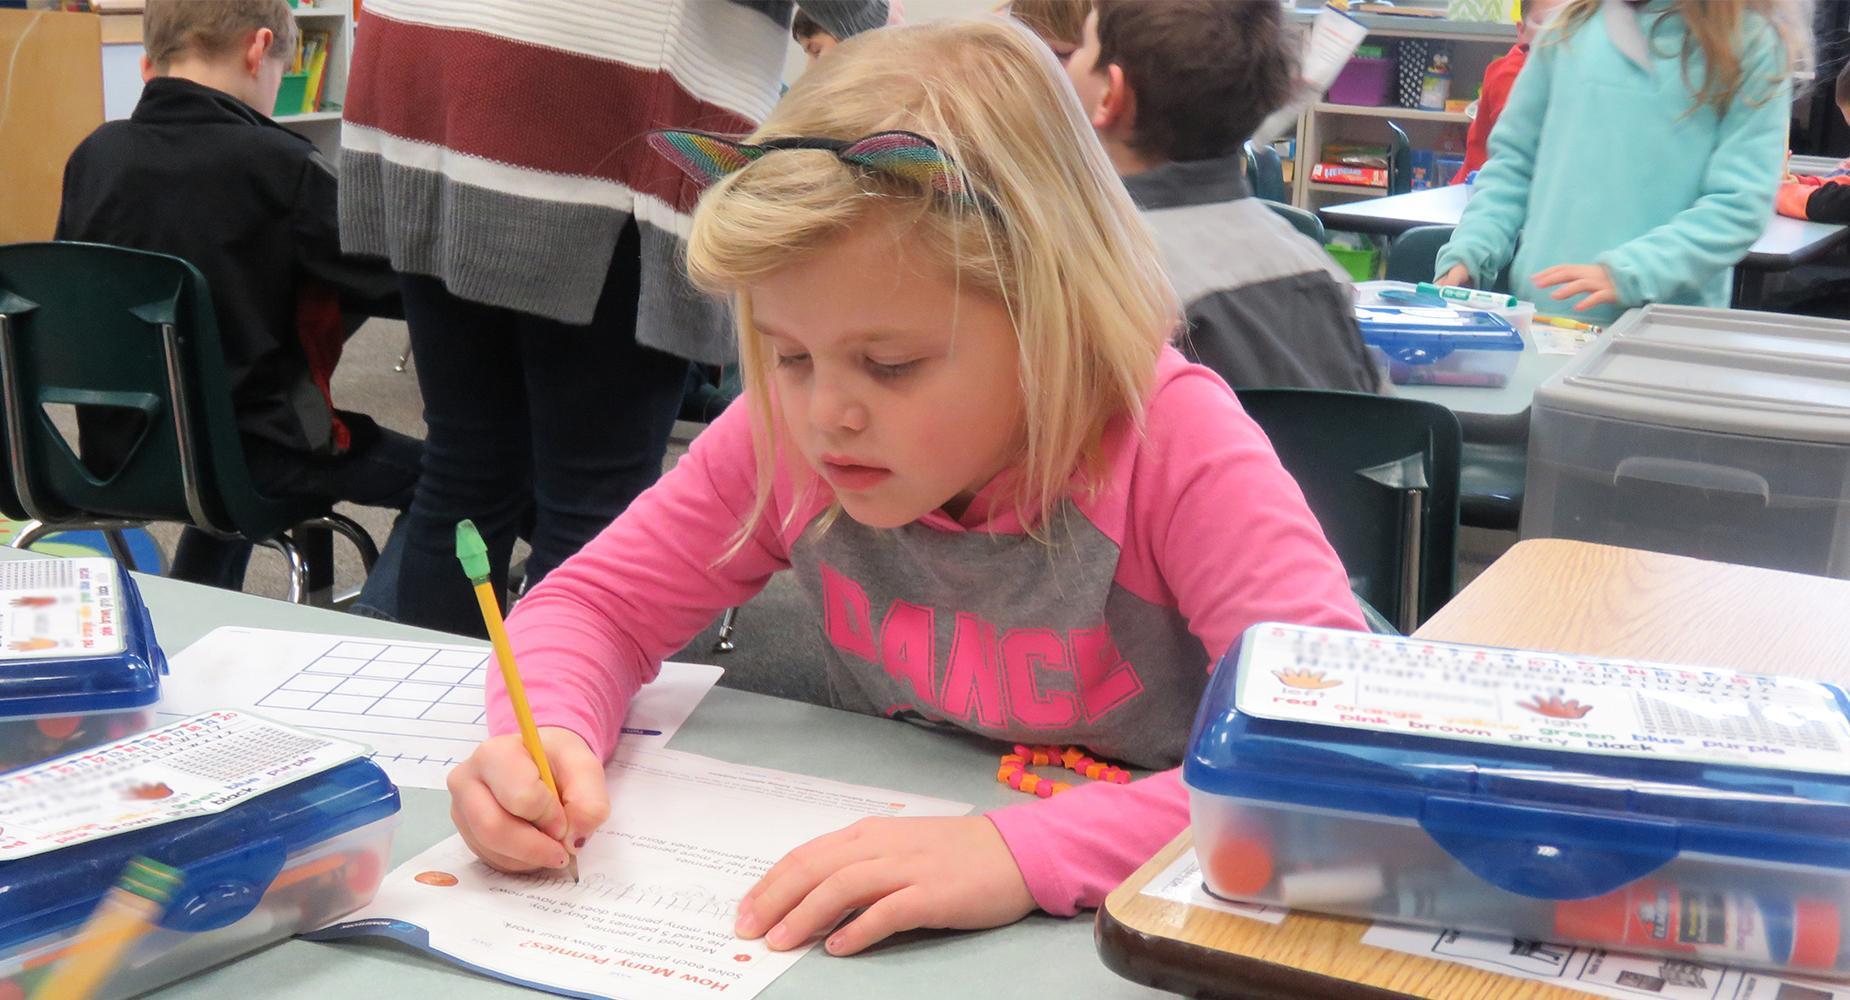 A girl in pink works on a worksheet at her desk.